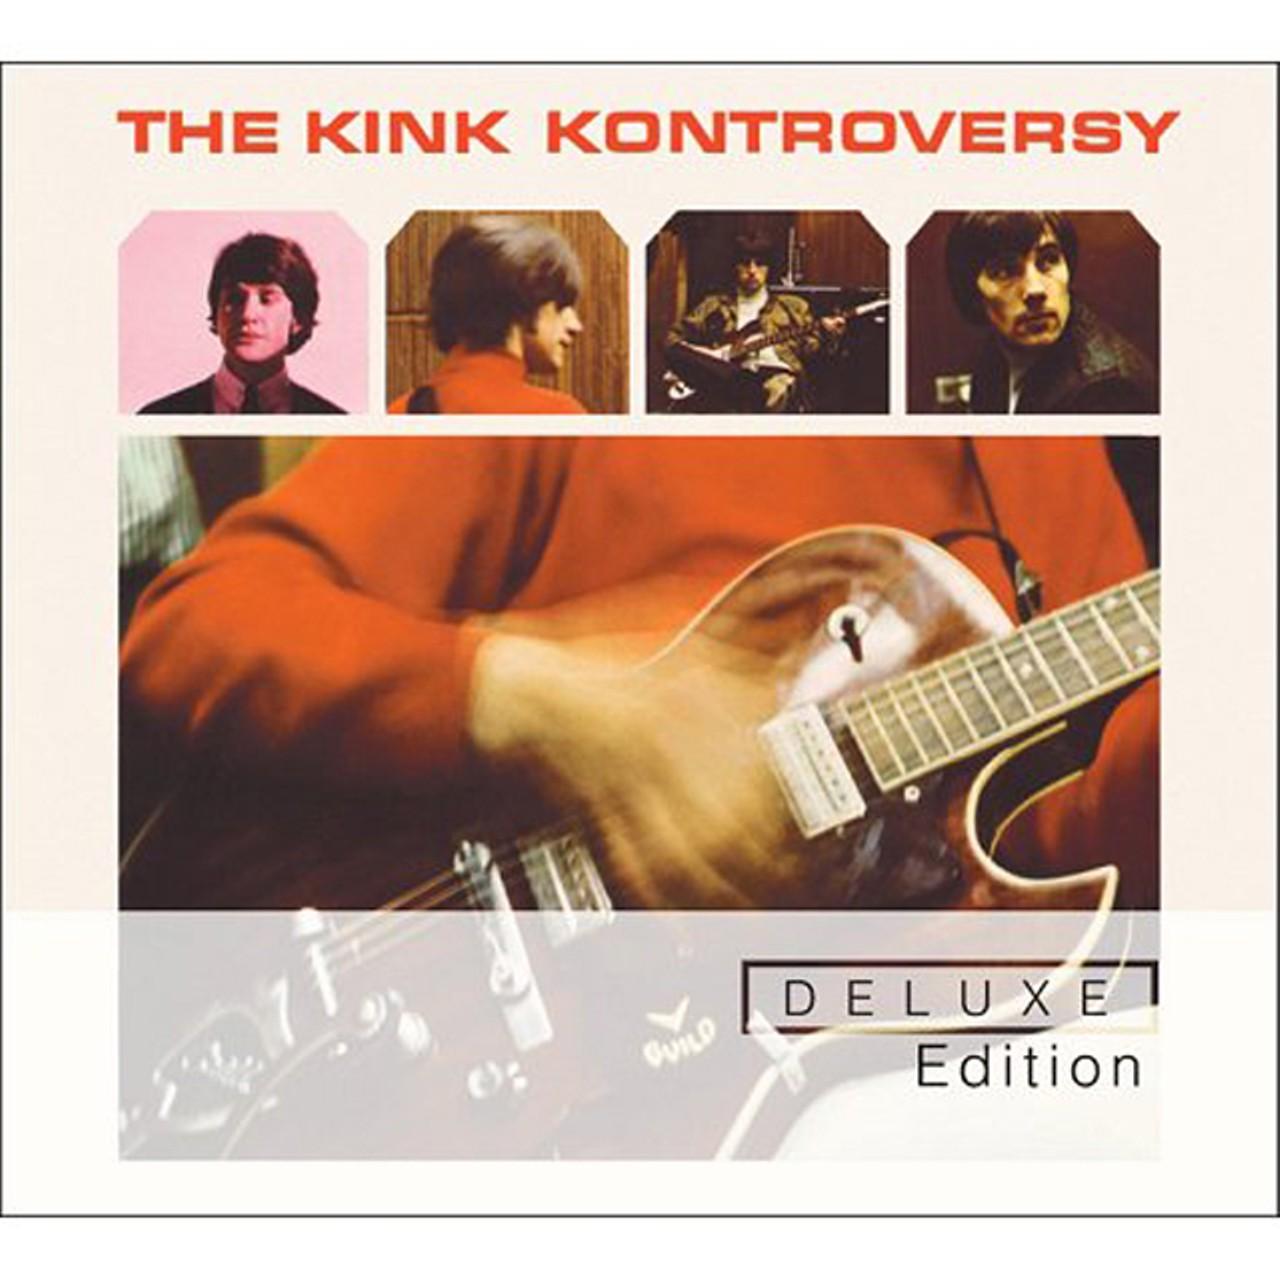 Kinks - Kinks, Kinda Kinks, The Kinks Kontroversy | Local Music ...